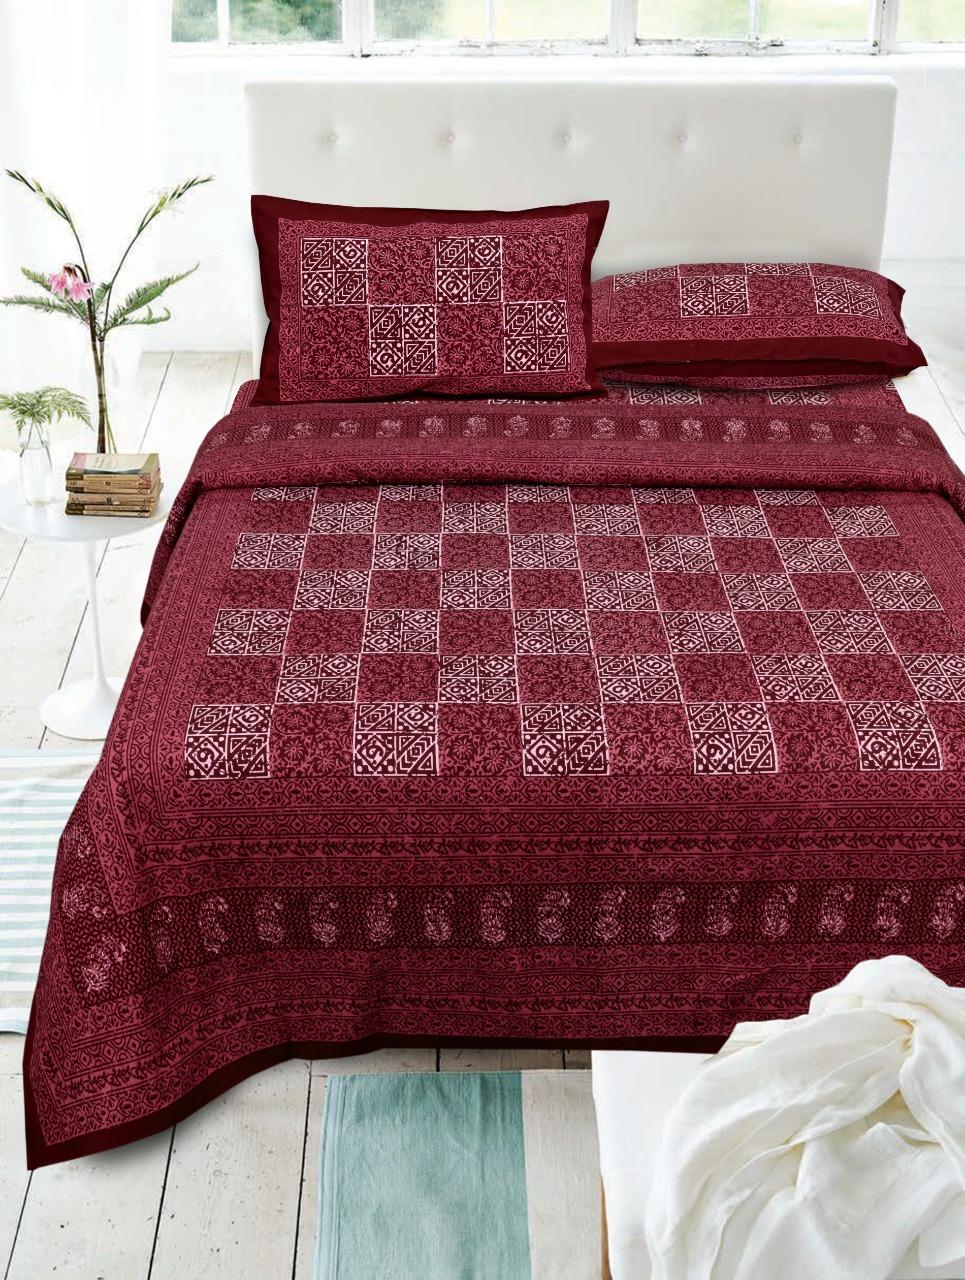 Daabu Prints Cotton Bed Sheets Dark Color Matching Bedsheets Buy Online